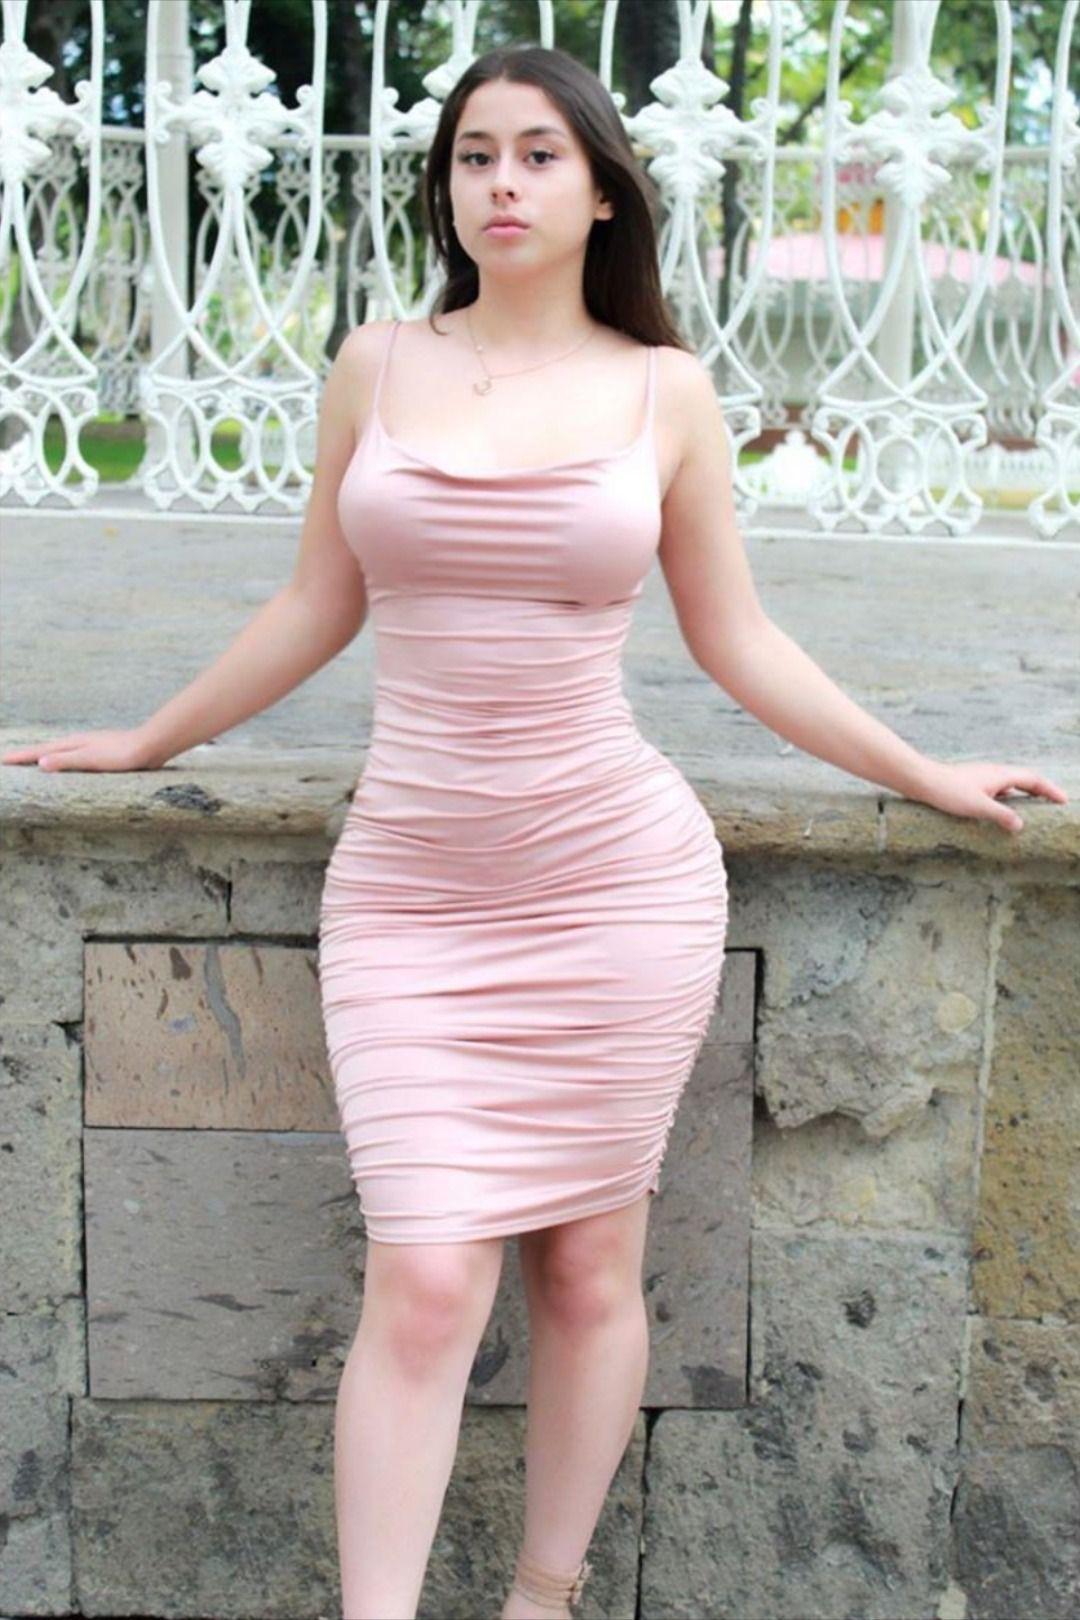 Pin on Beautiful hot women/fashion